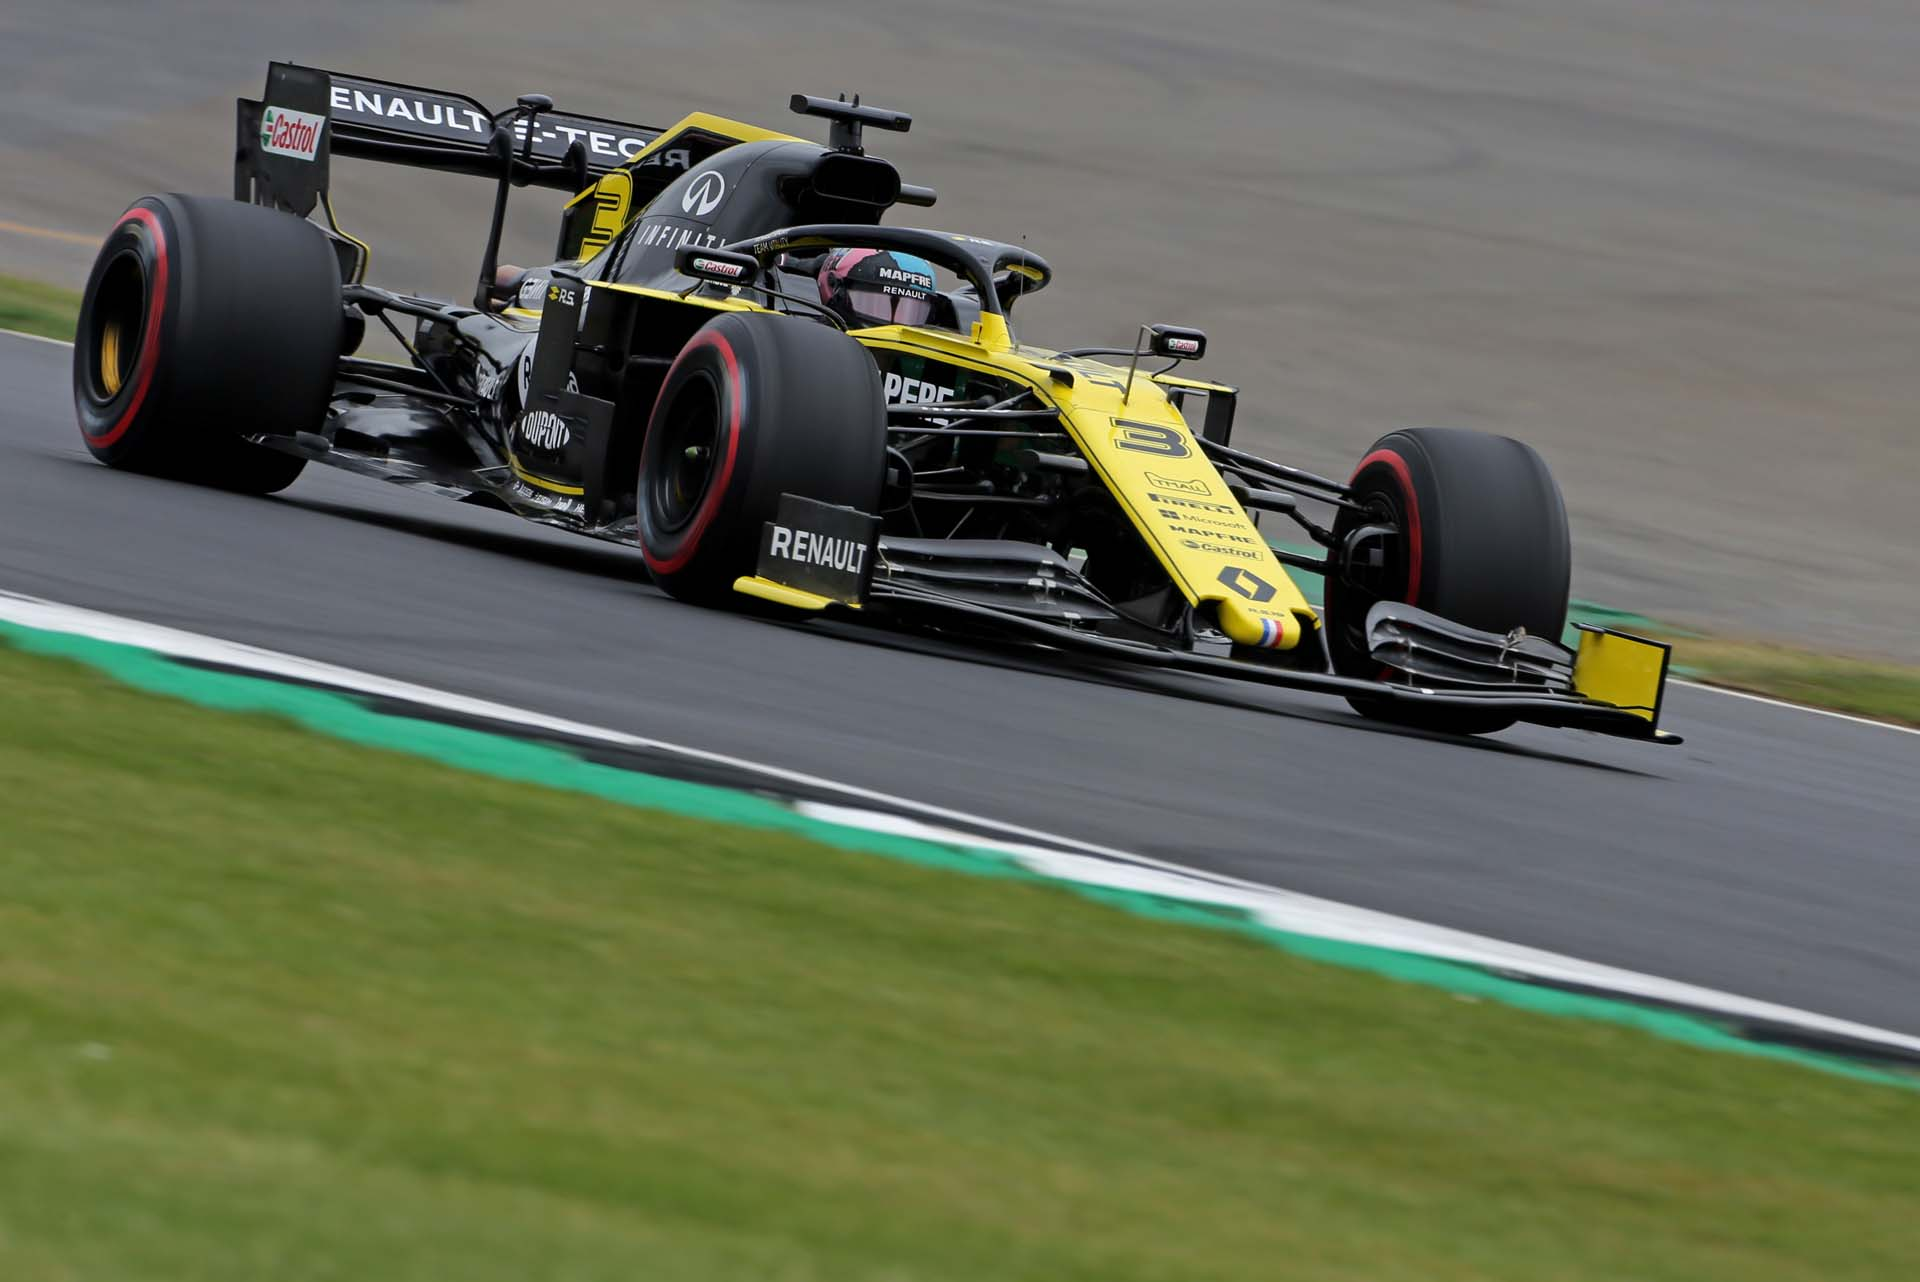 Daniel Ricciardo (AUS) Renault F1 Team RS19. British Grand Prix, Saturday 13th July 2019. Silverstone, England.